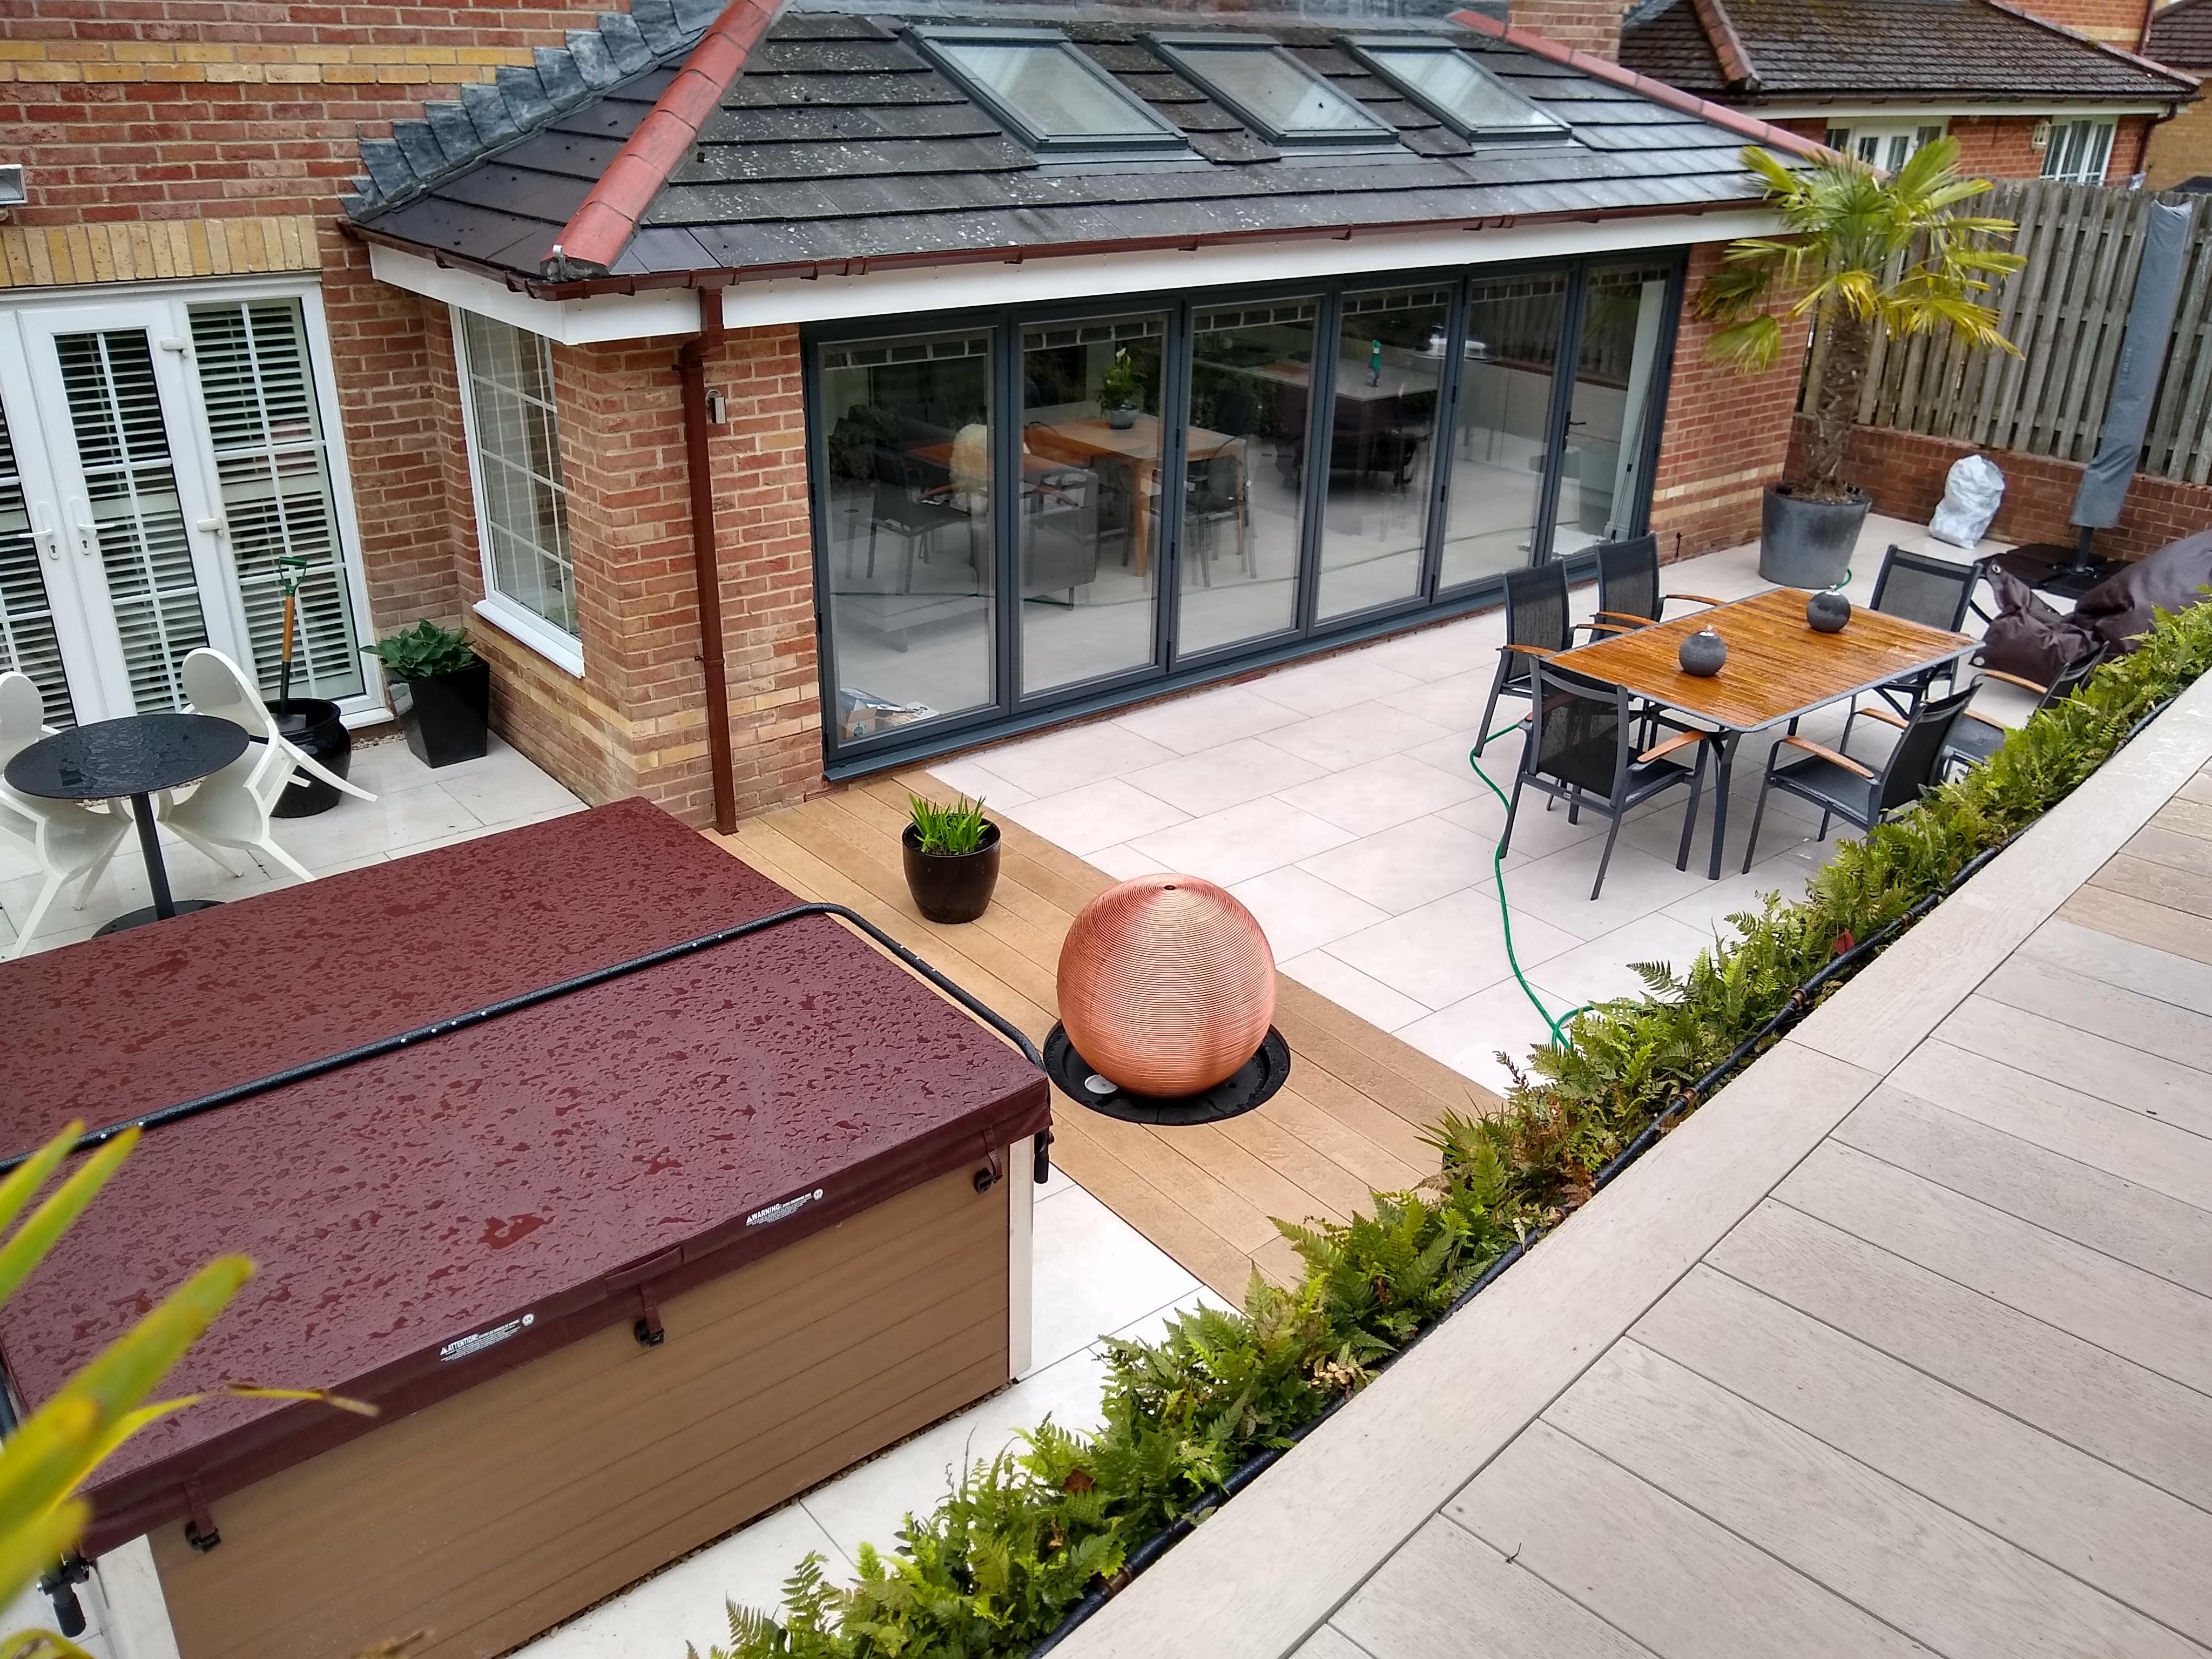 Driveways & patios